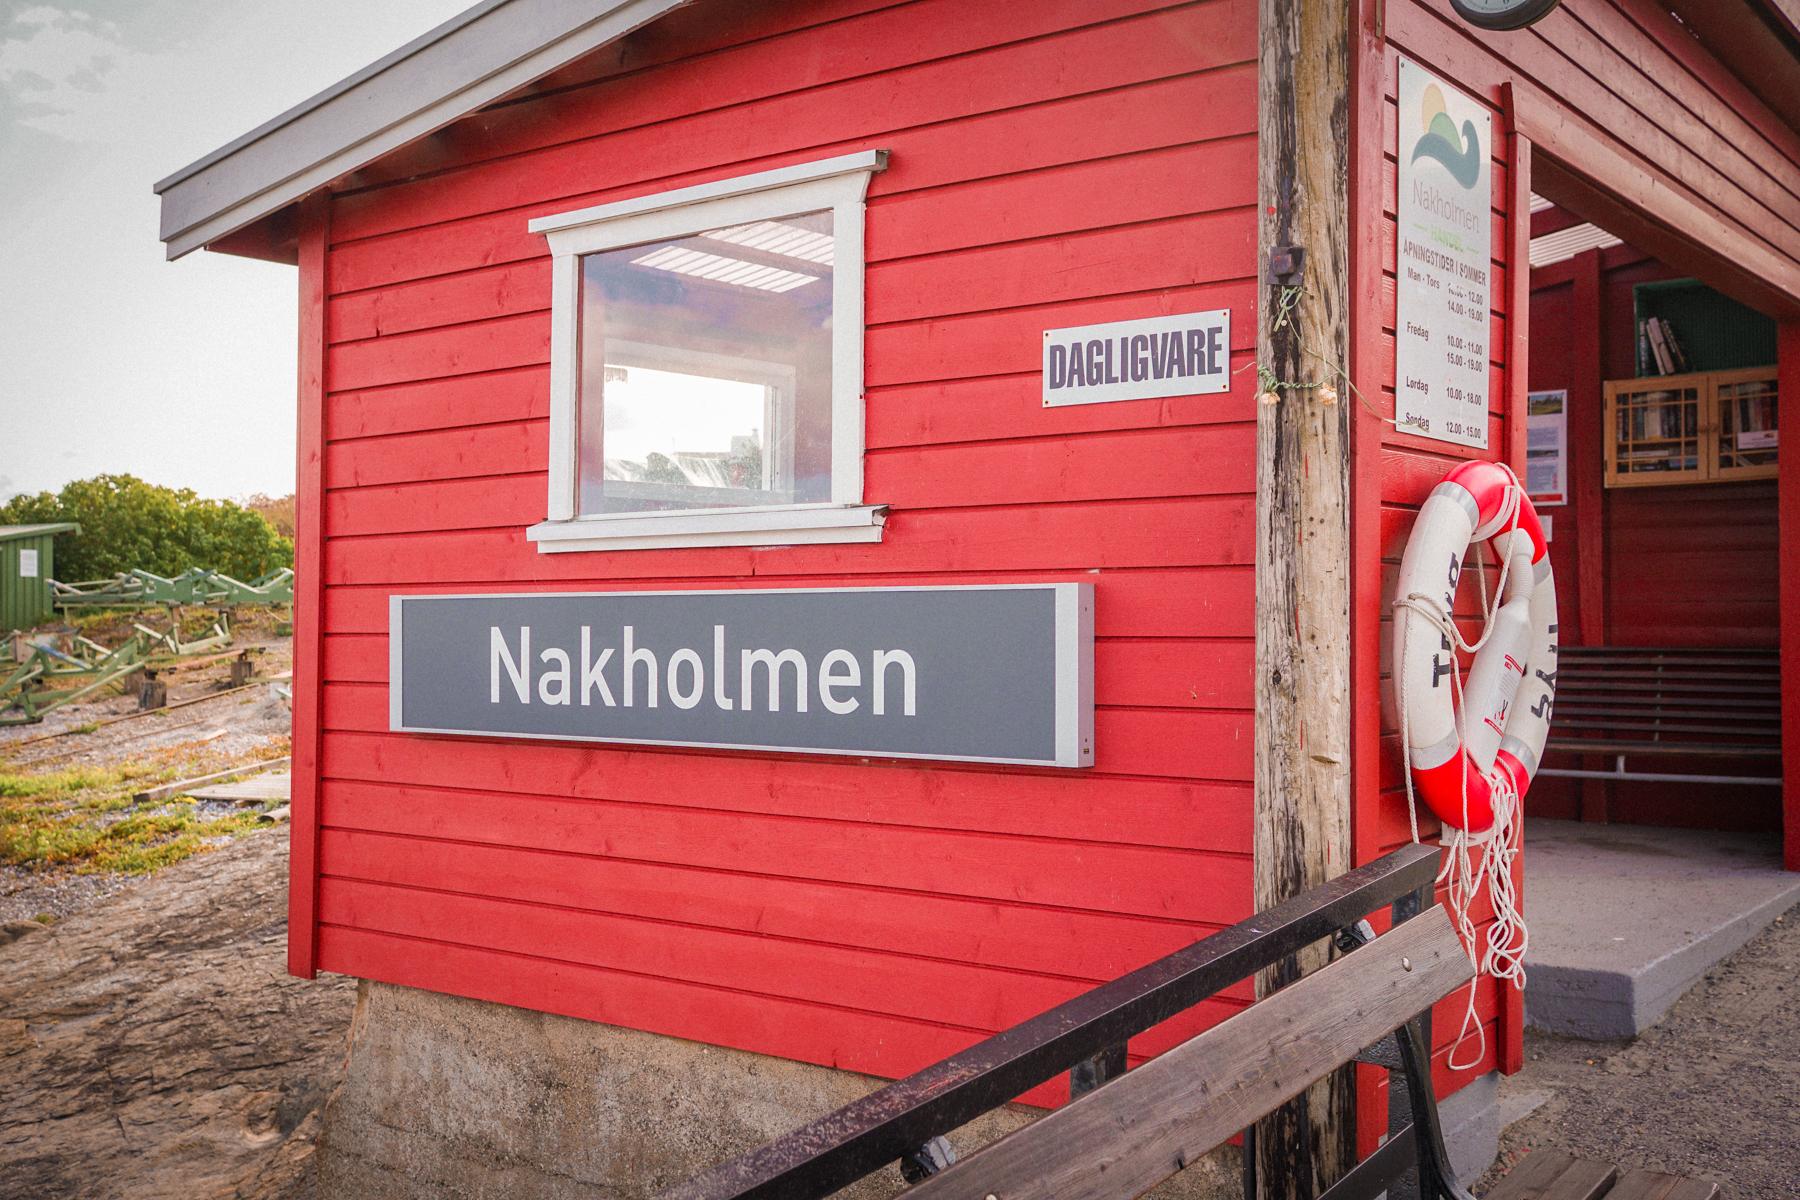 Nakholmen